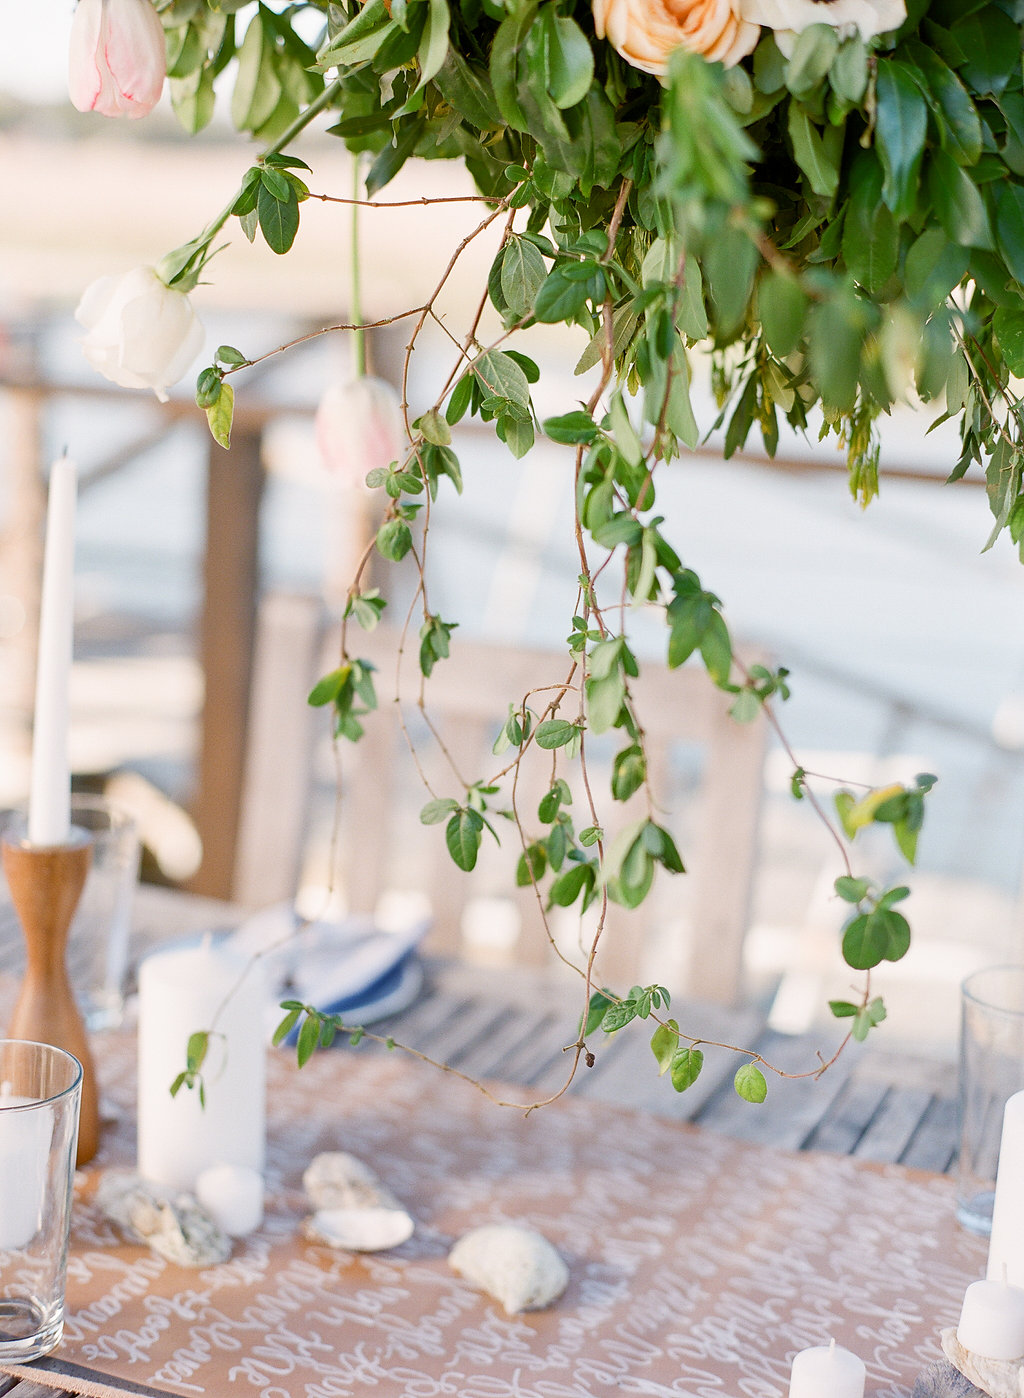 hanging-centerpiece-geometric-shape-wedding-inspiration-ivory-and-beau-savannah-wedding-florist-savannah-wedding-planner-savannah-event-designer-the-wyld-dock-bar-wedding-savannah-georgia-outdoor-rustic-wedding.jpg